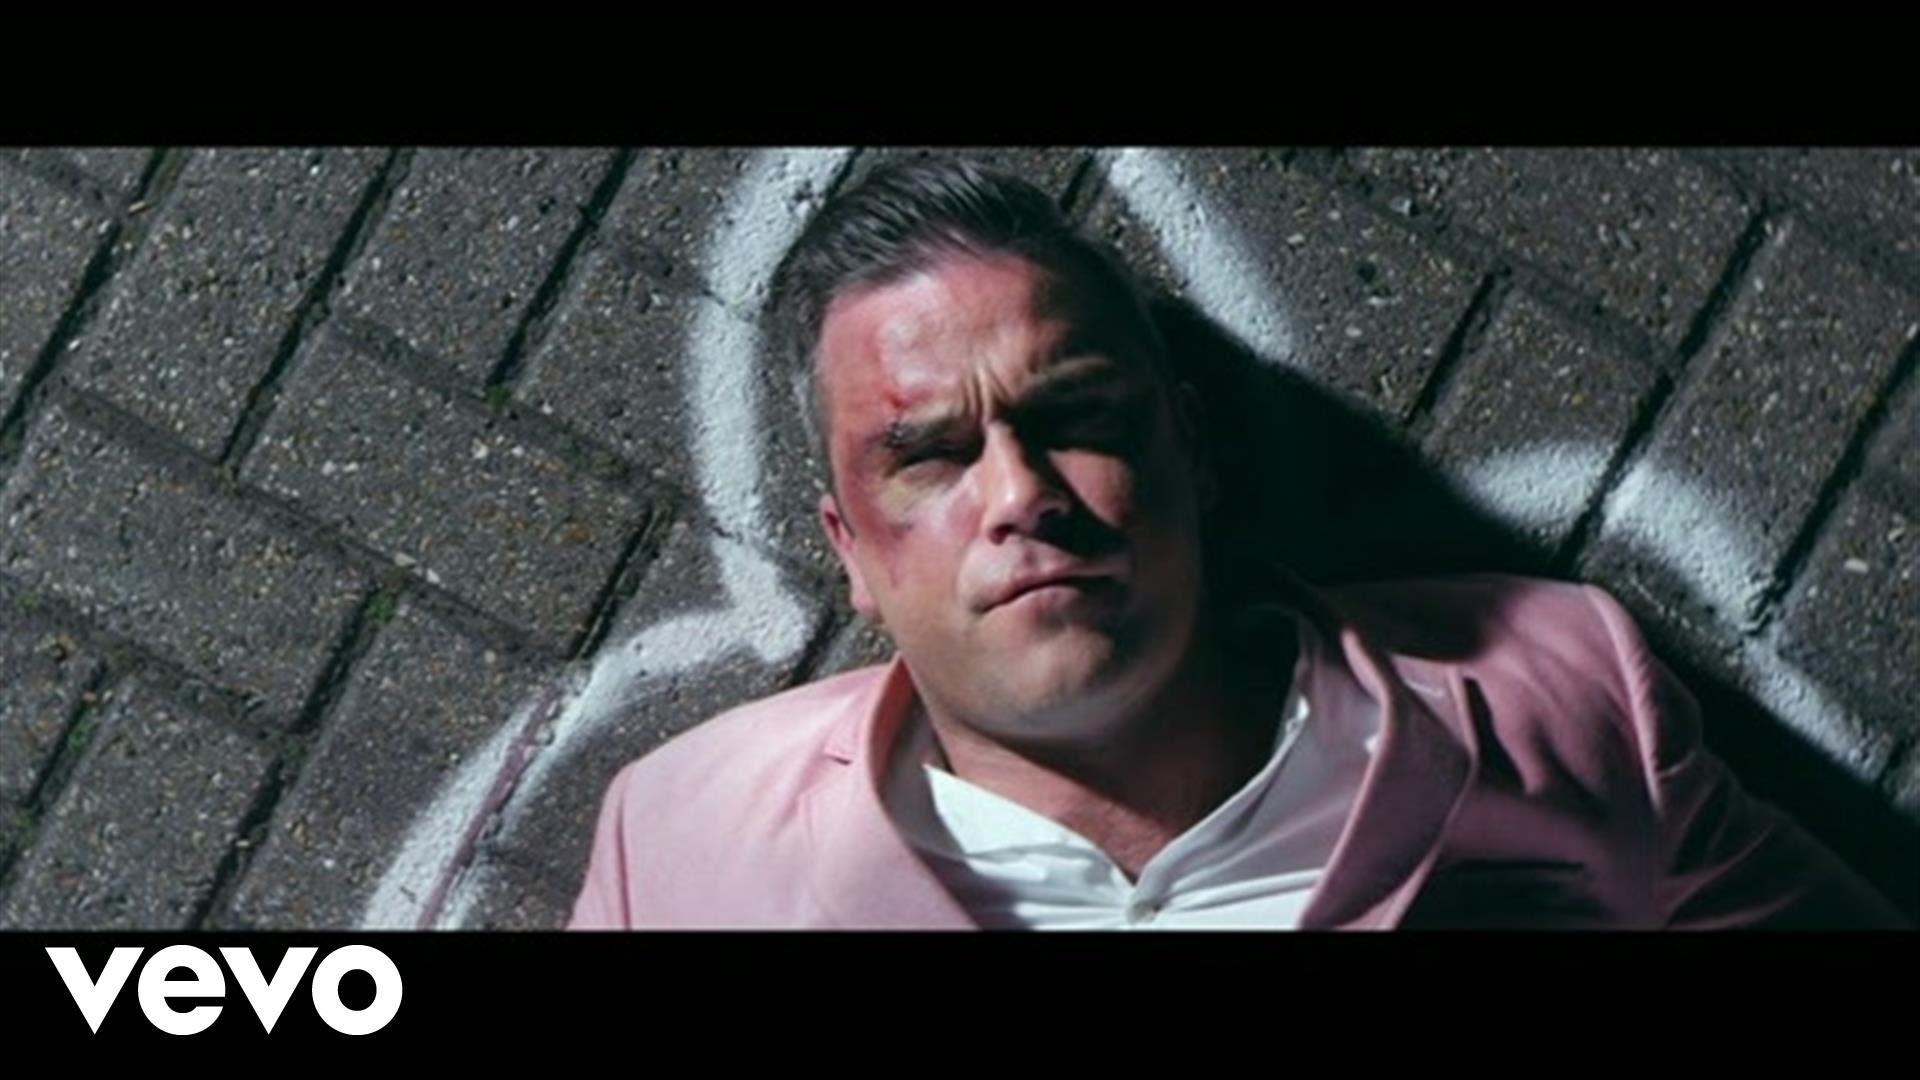 Robbie Williams – Candy